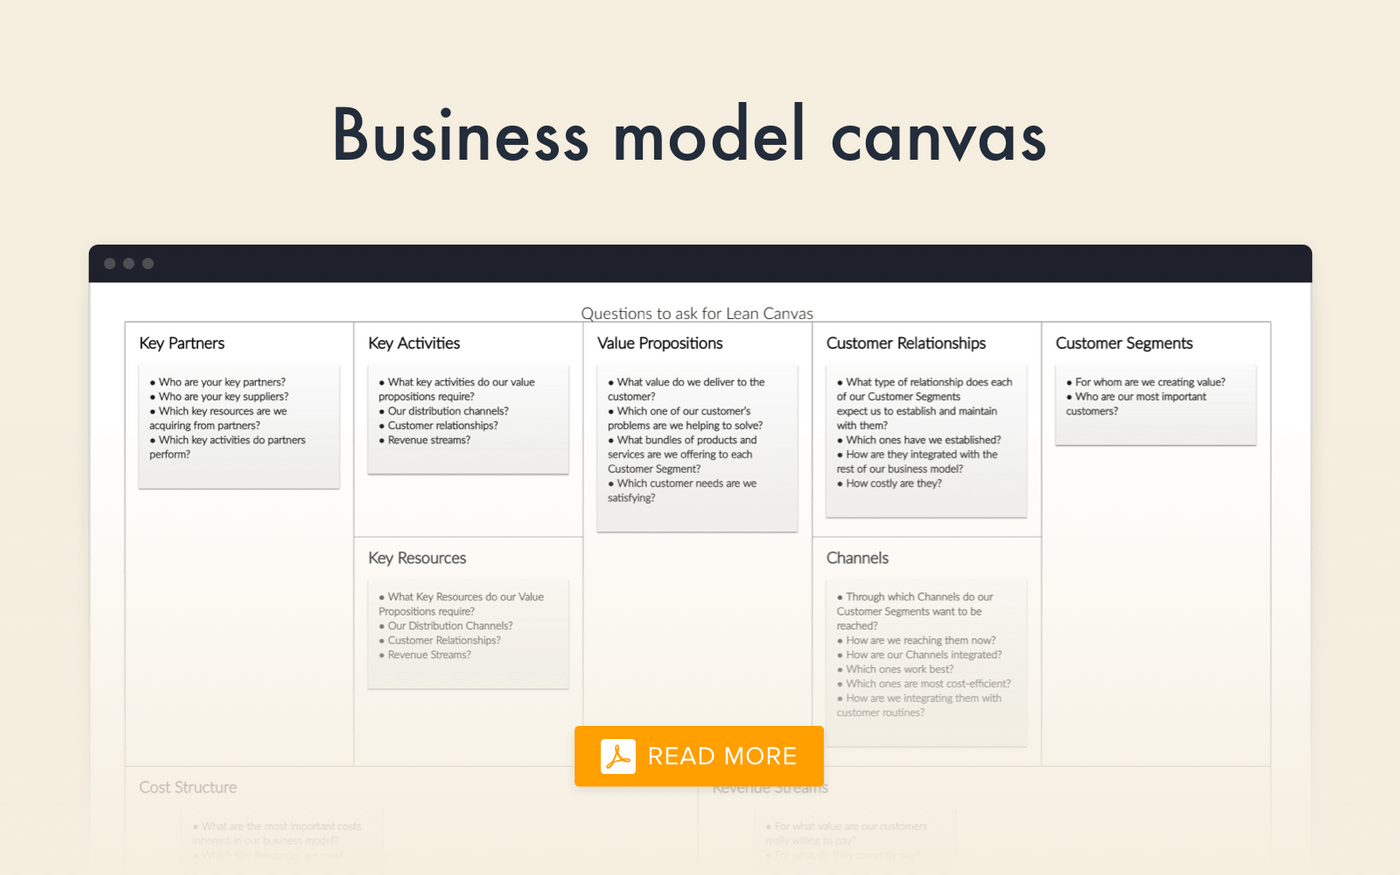 Lean canvas for an Uber-like app